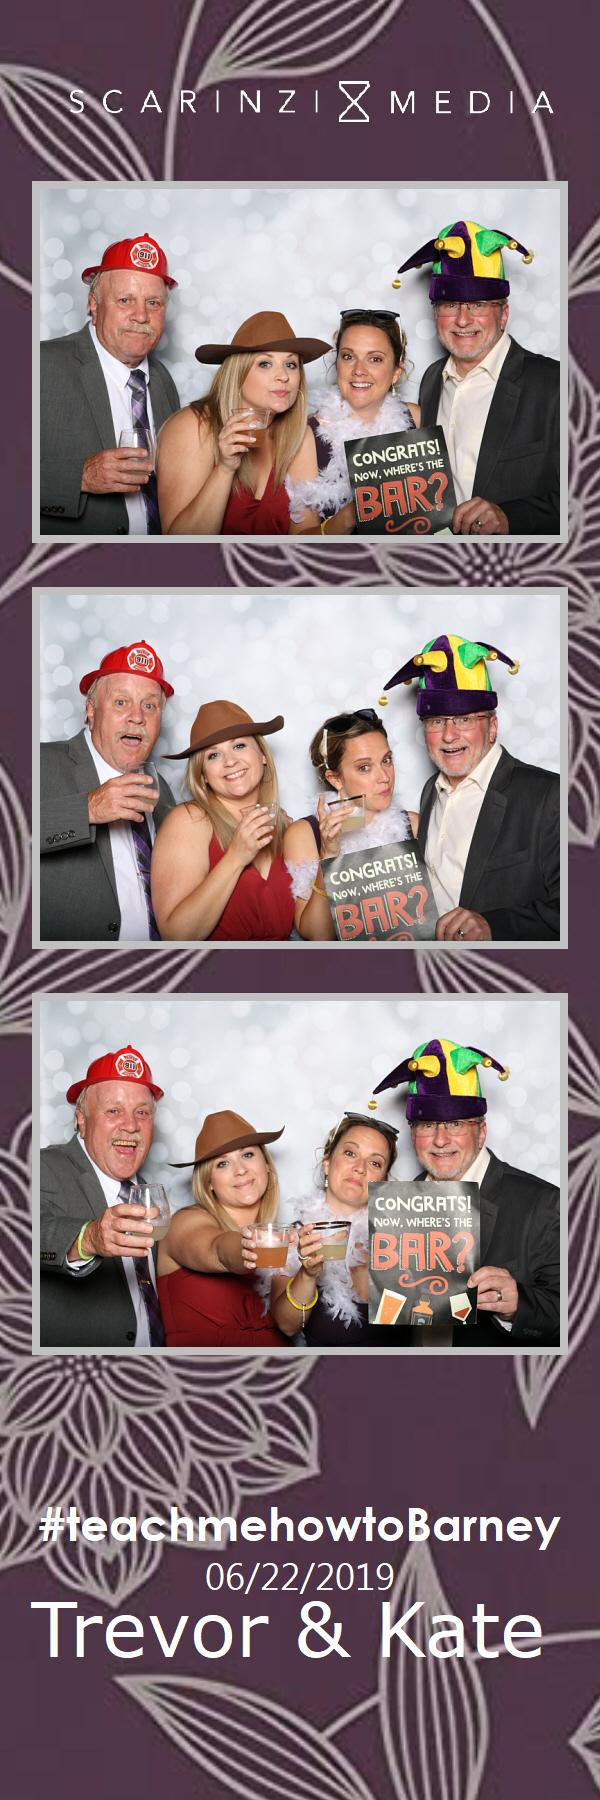 2019.06.22 - Barney Wedding PHOTOBOOTH70.jpg